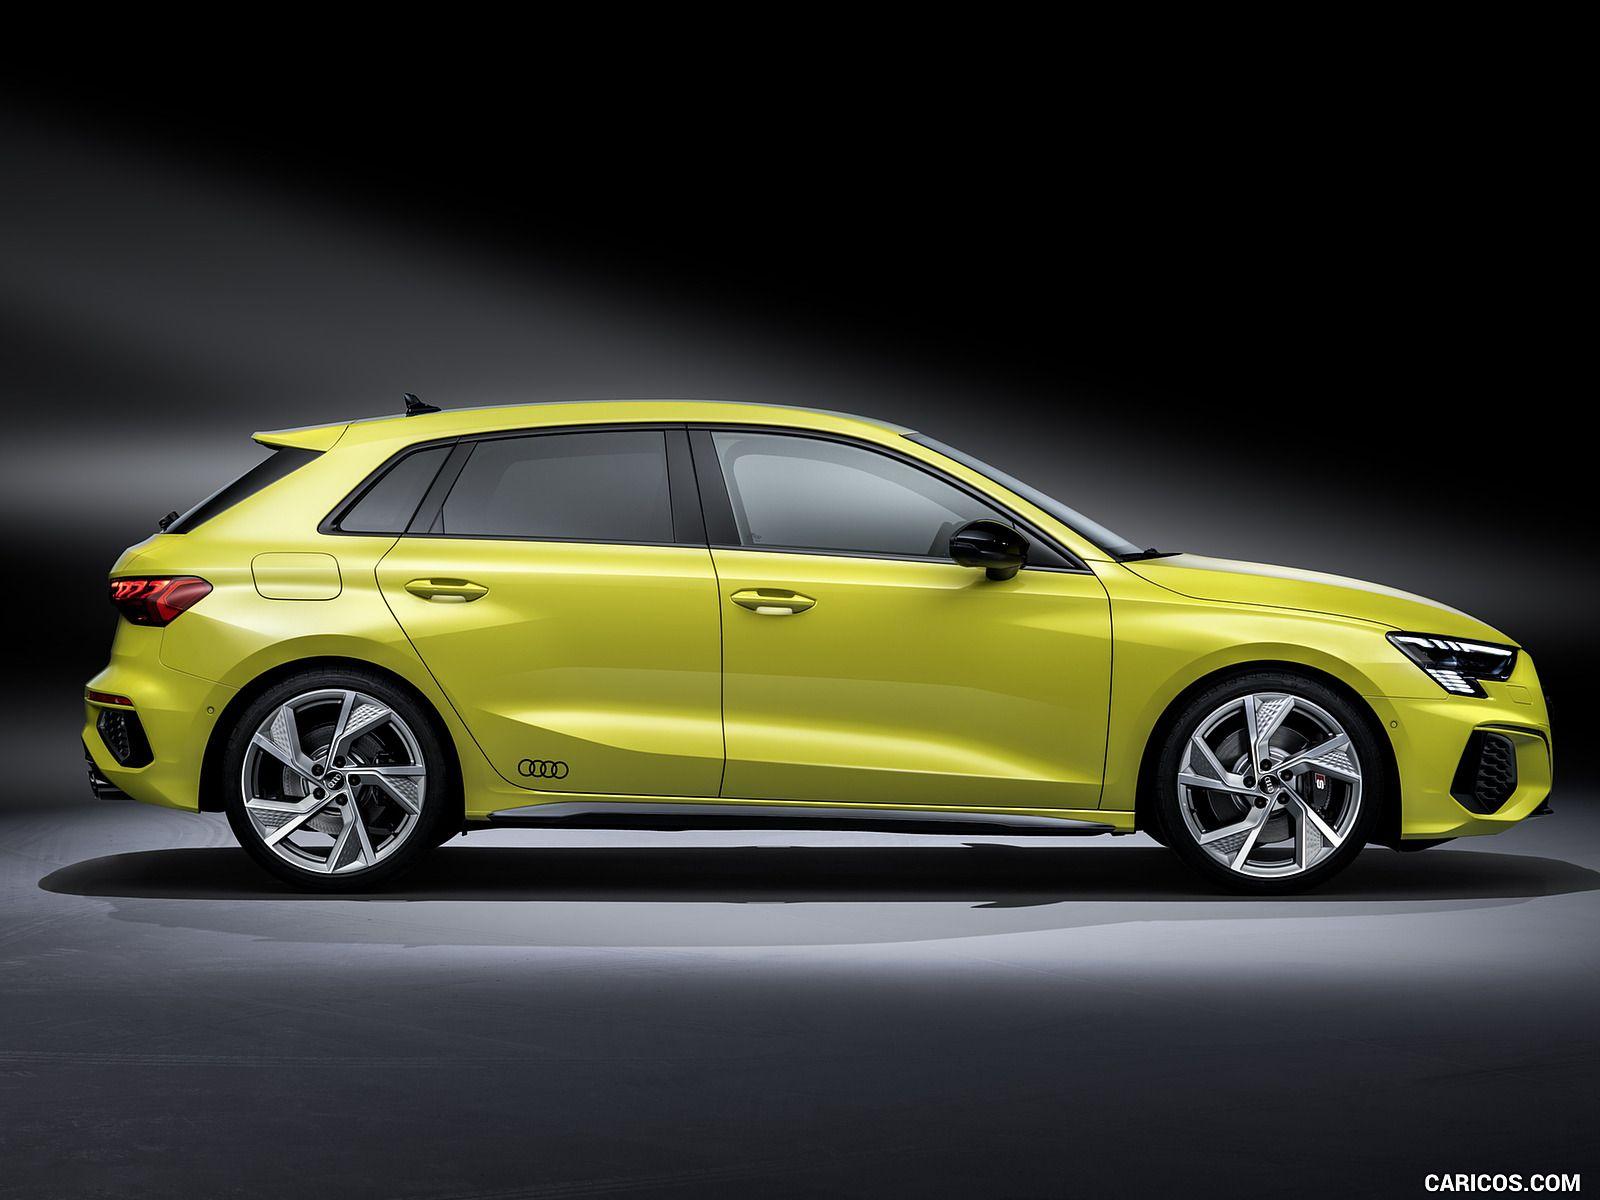 2021 Audi S3 Sportback Wallpaper Audi S3 Sportback Audi Bmw Car